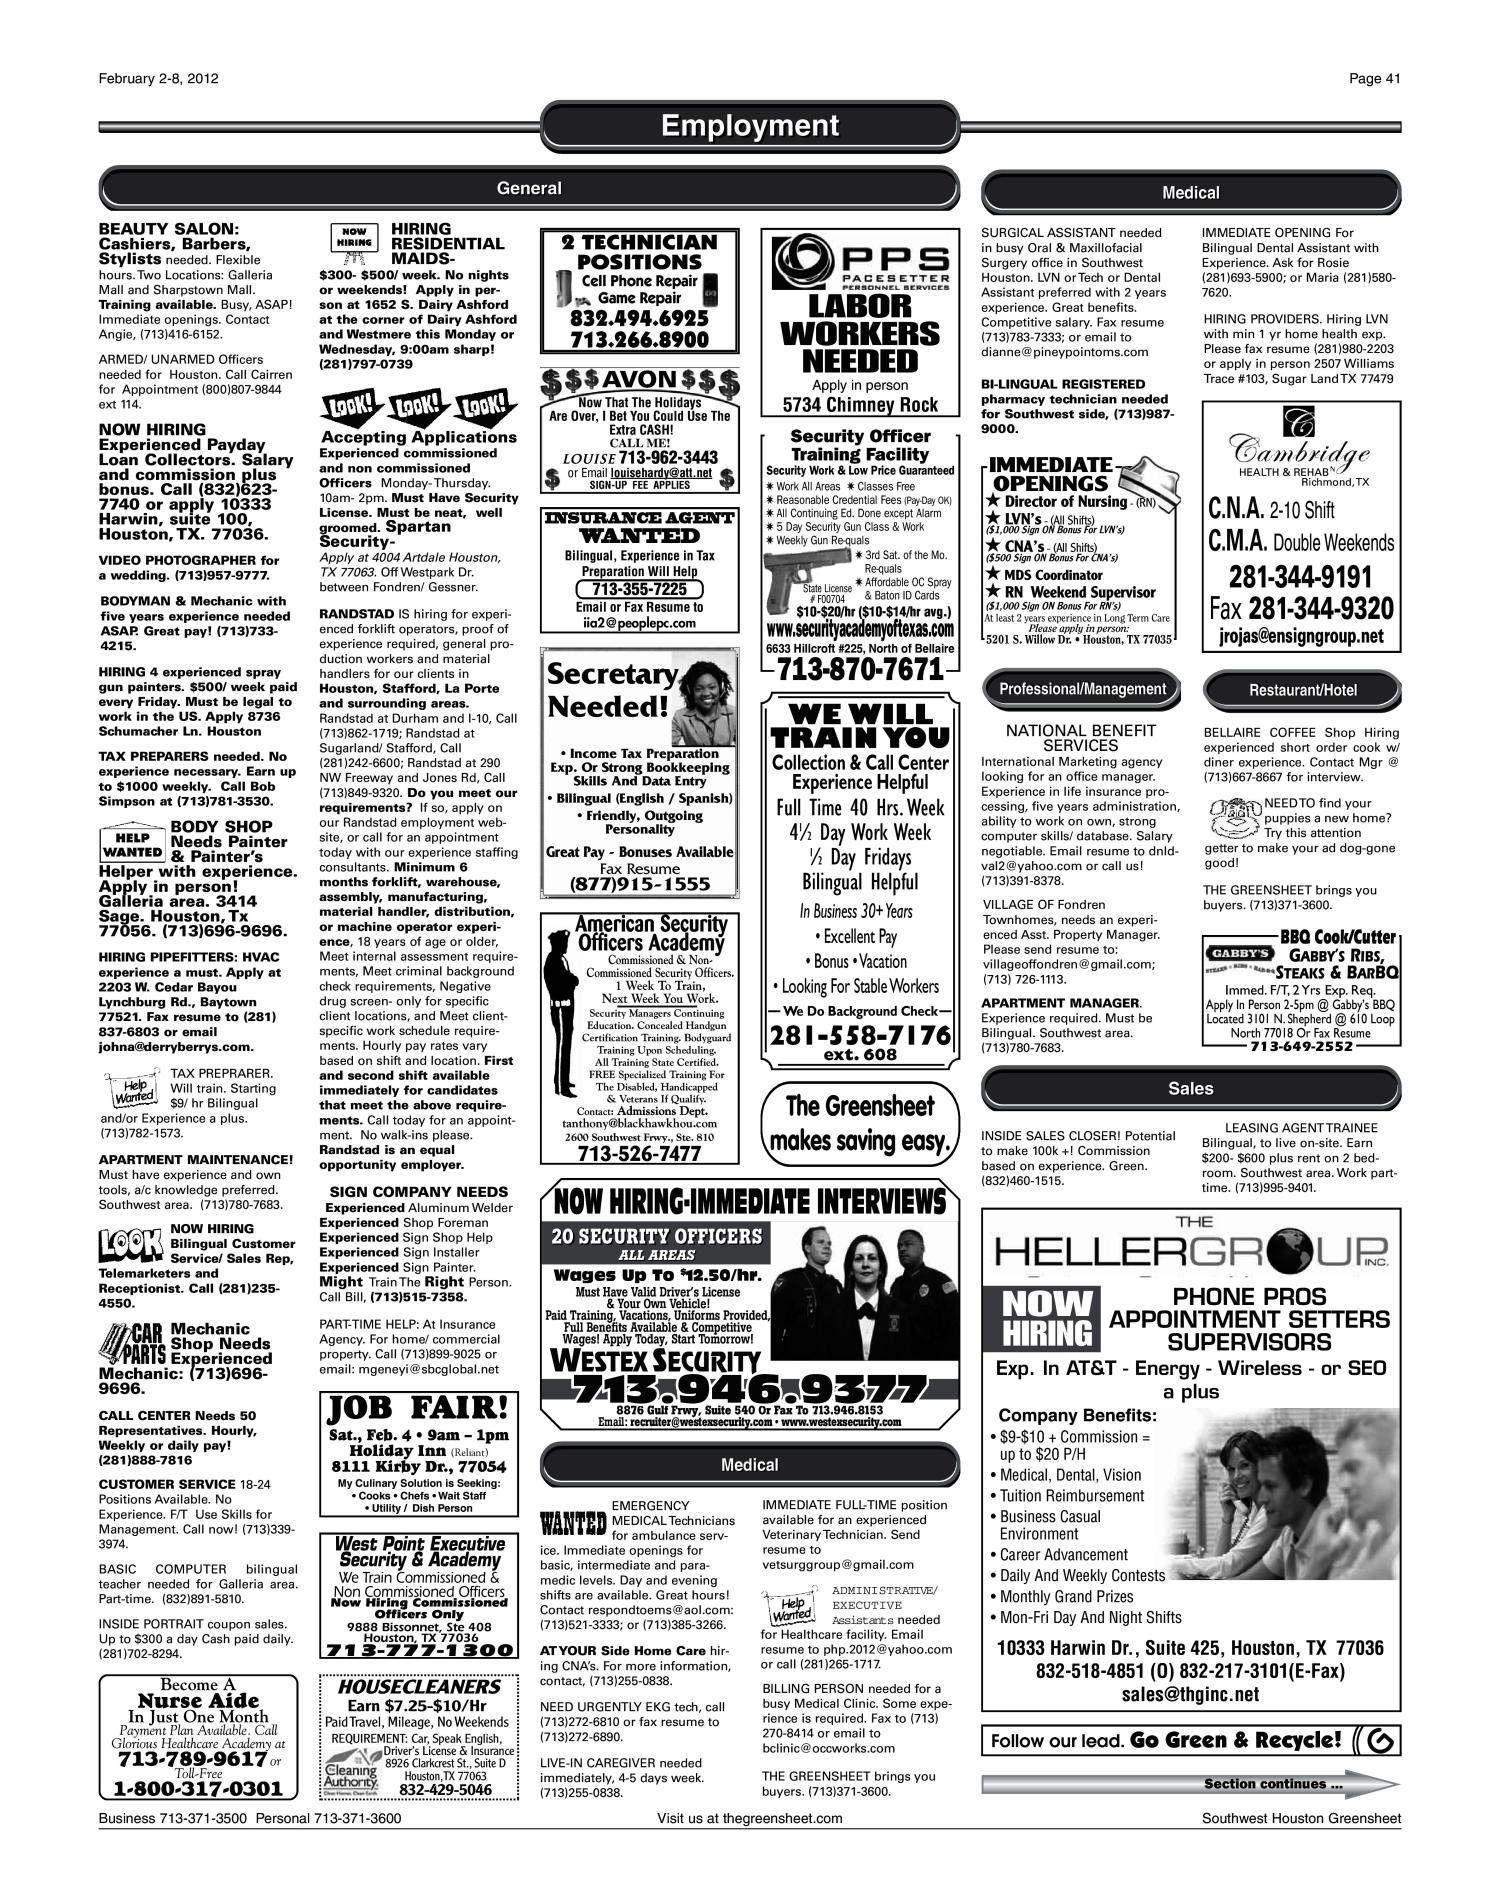 The Greensheet Houston Tex Vol 43 No 8 Ed 1 Thursday